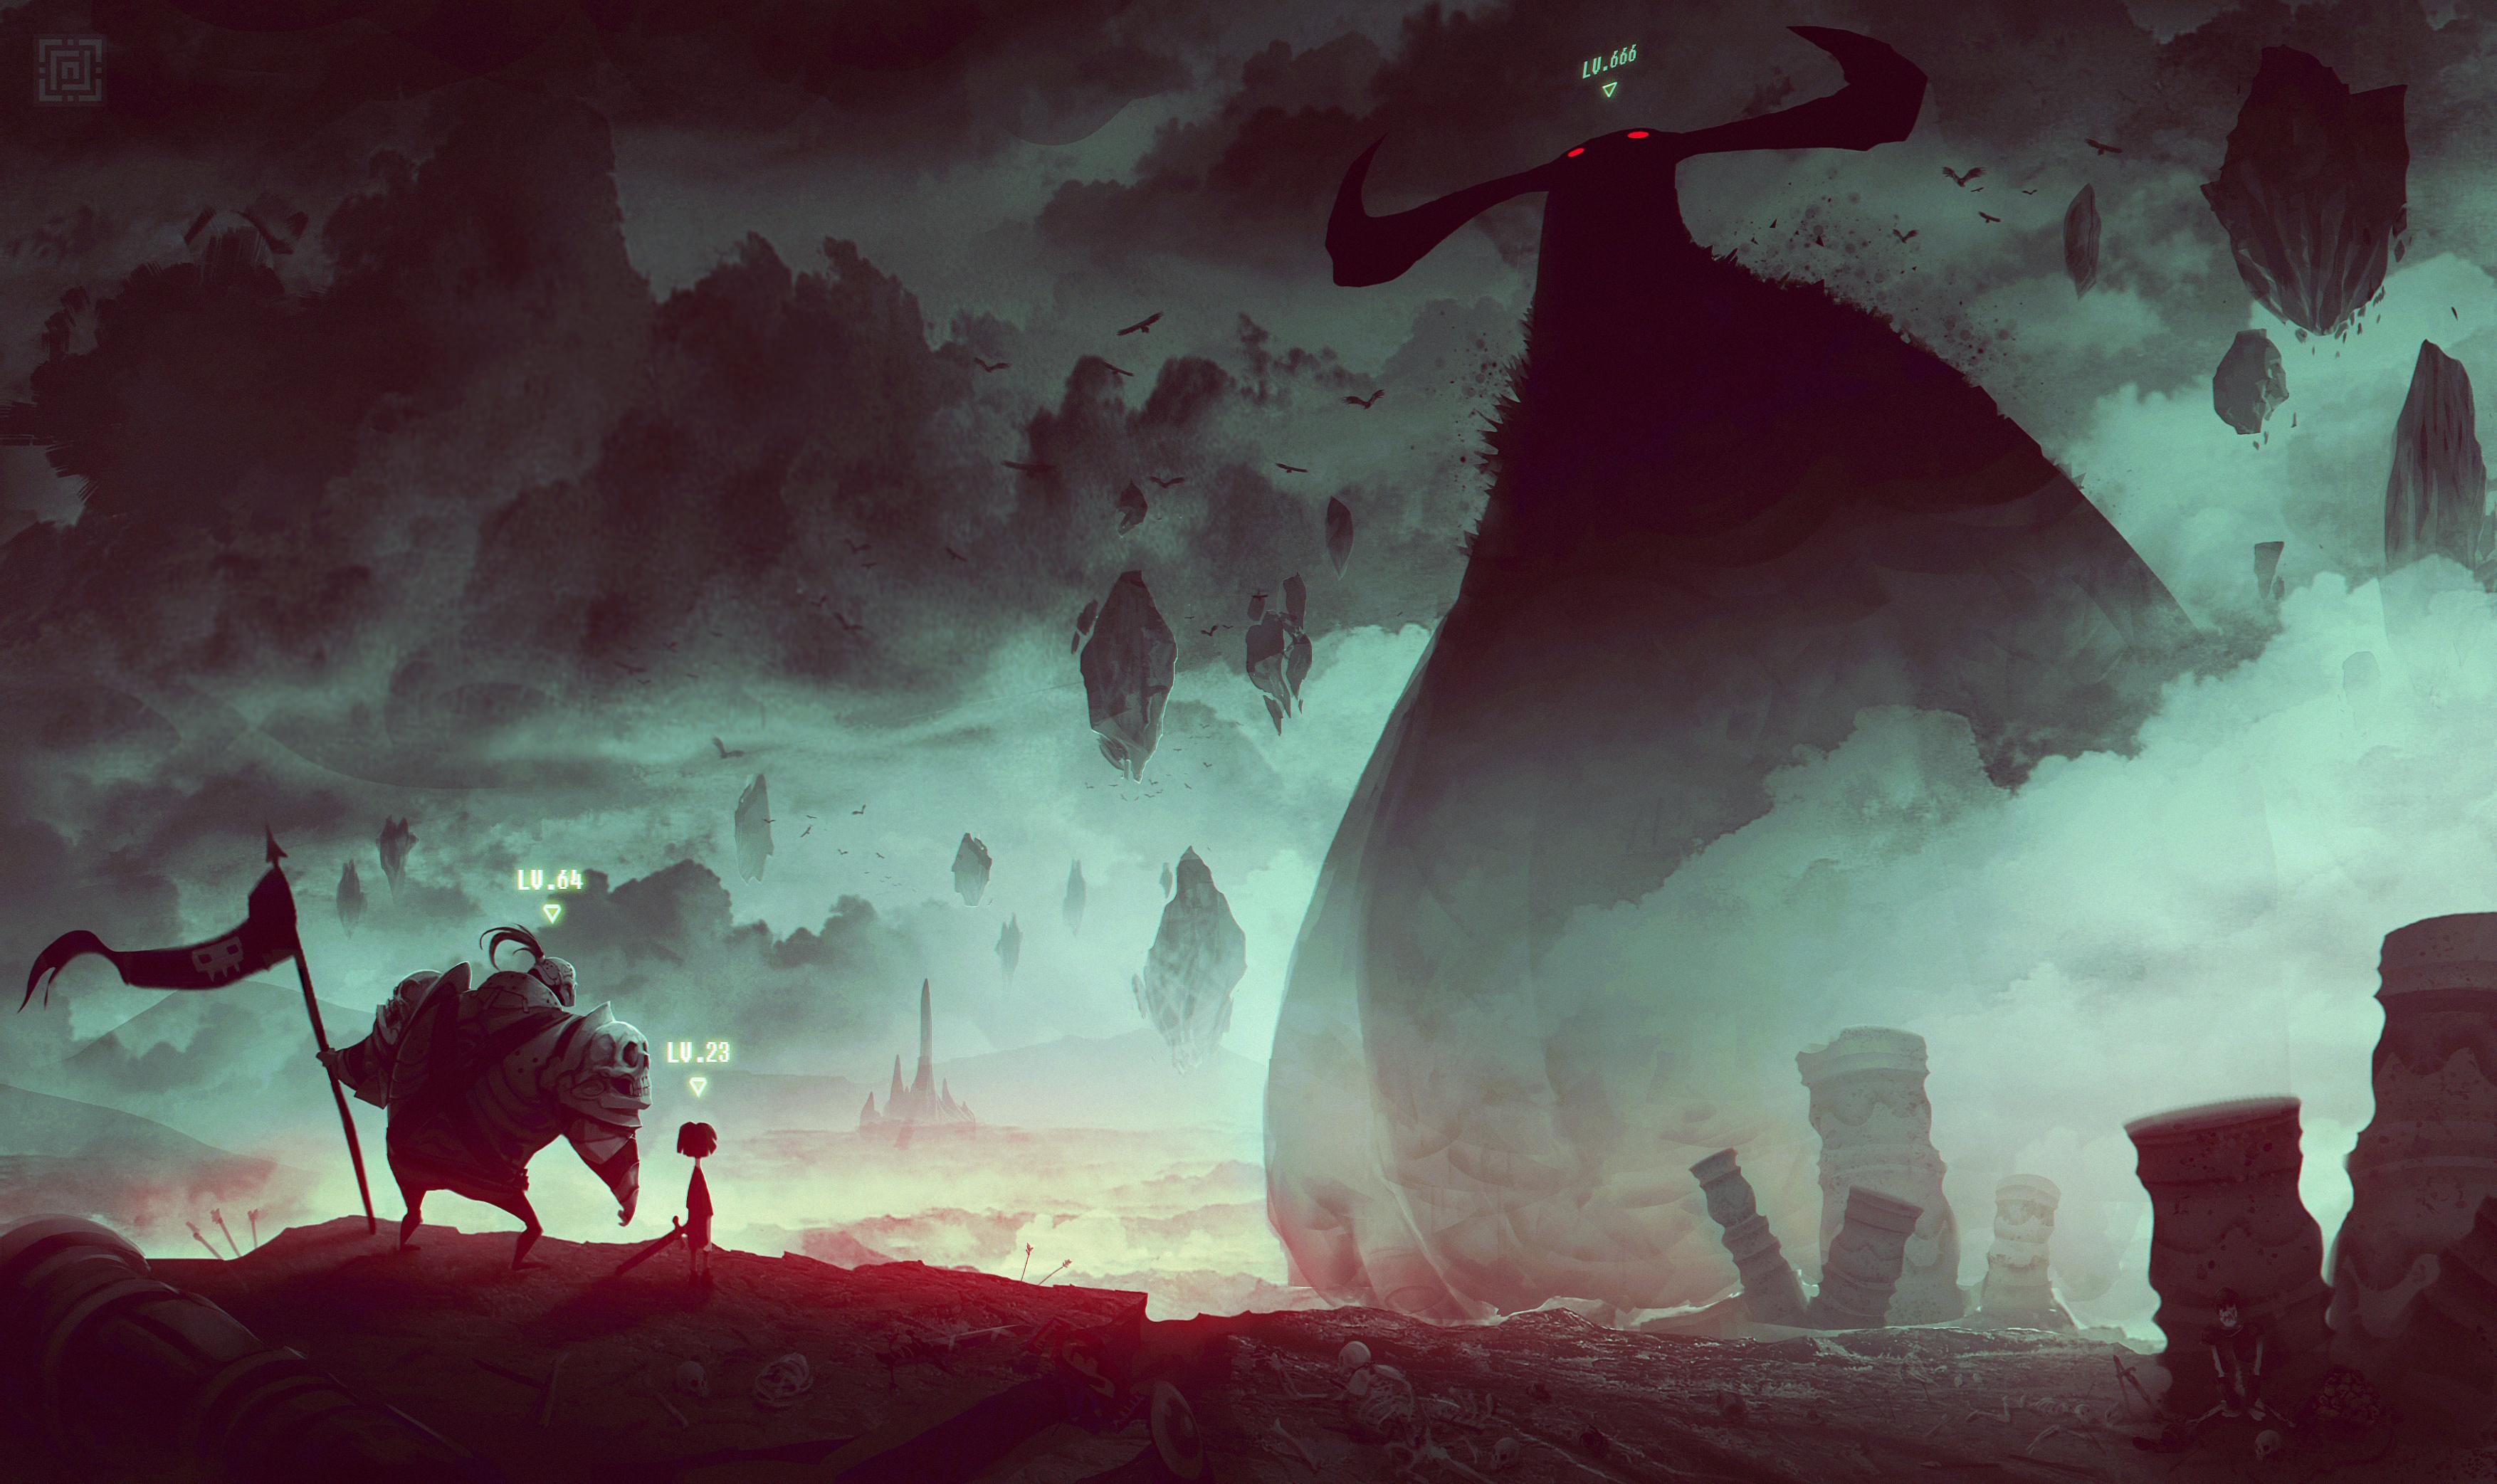 Картинка Монстры воин Фантастика Фантастический мир монстр чудовище воины Воители Фэнтези